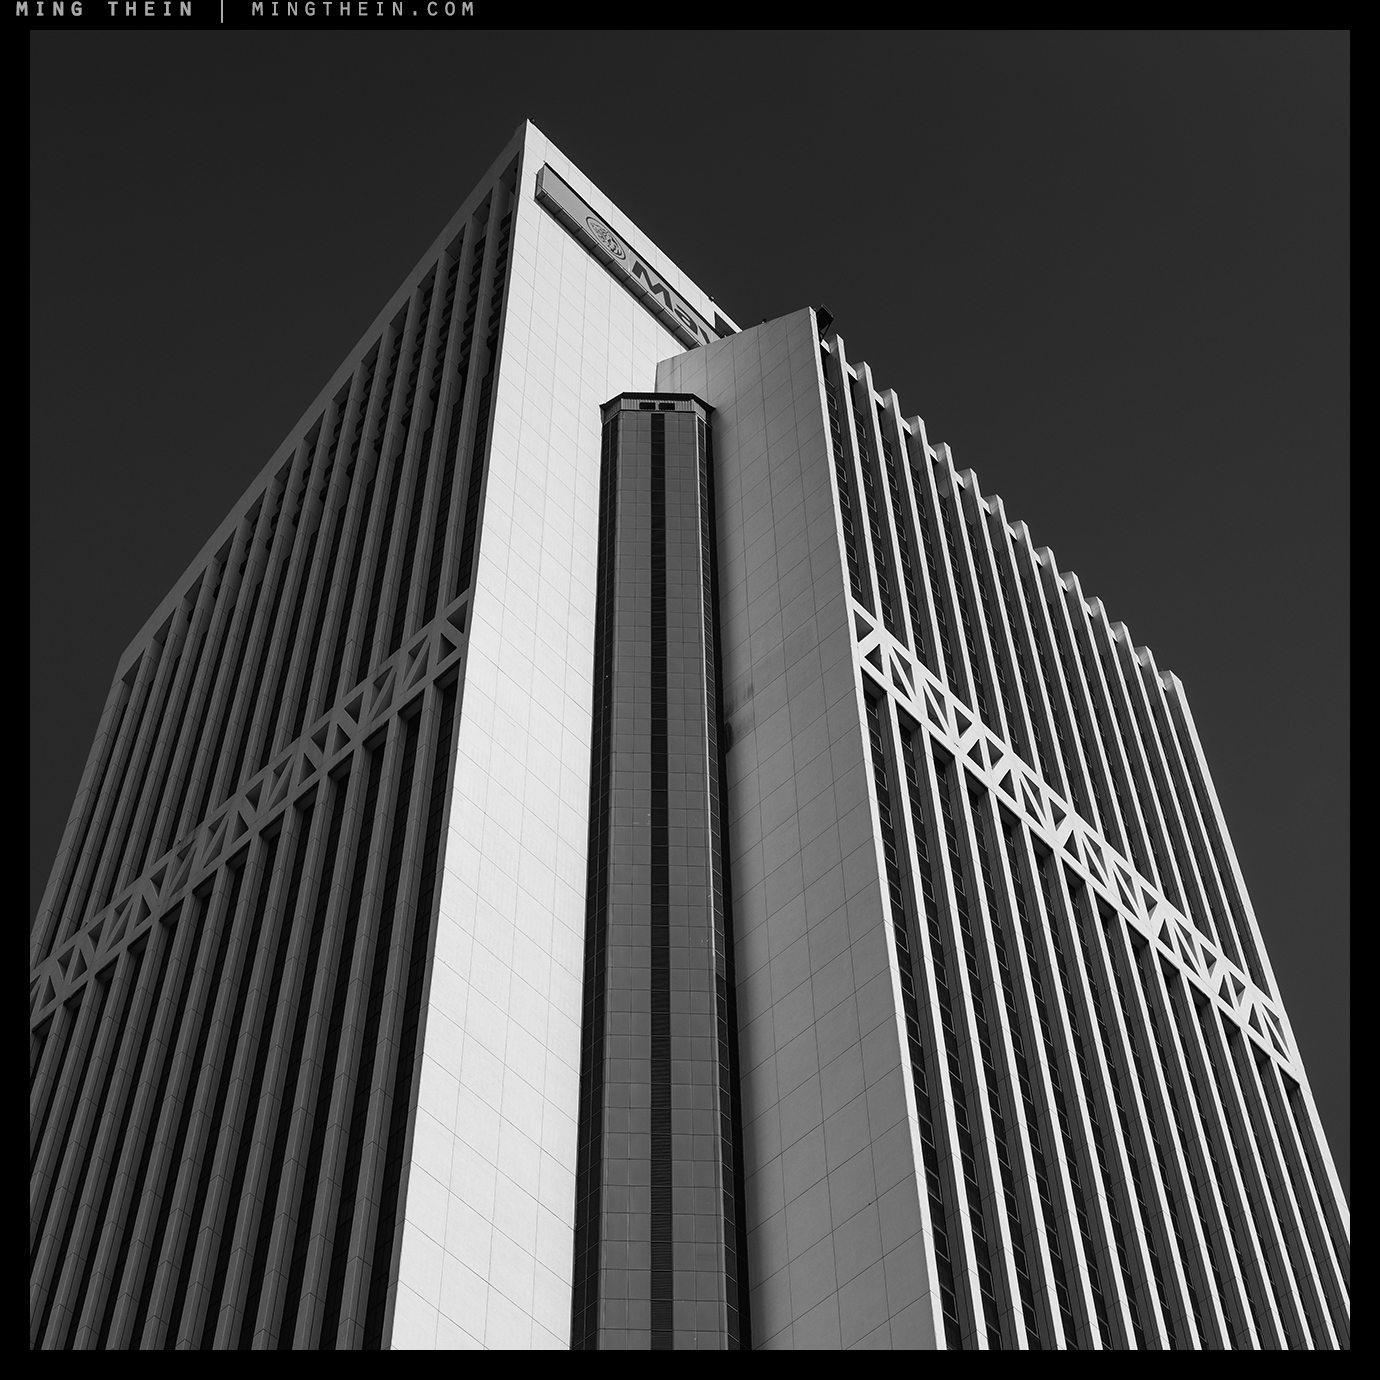 58_A72_DSC0139 verticality LVIII copy.jpg